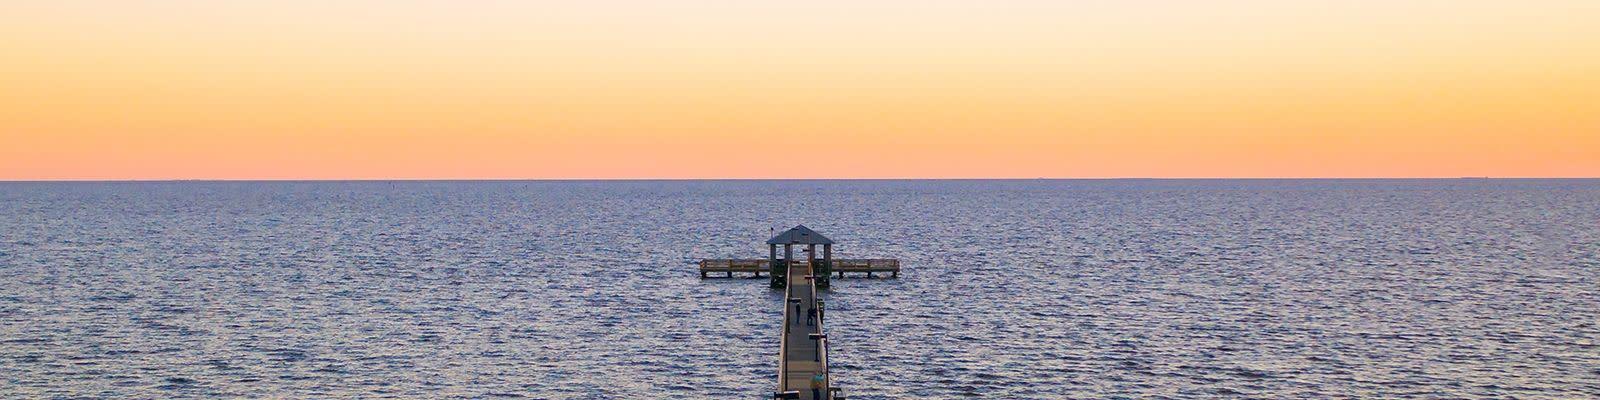 Coastal Mississippi Pier